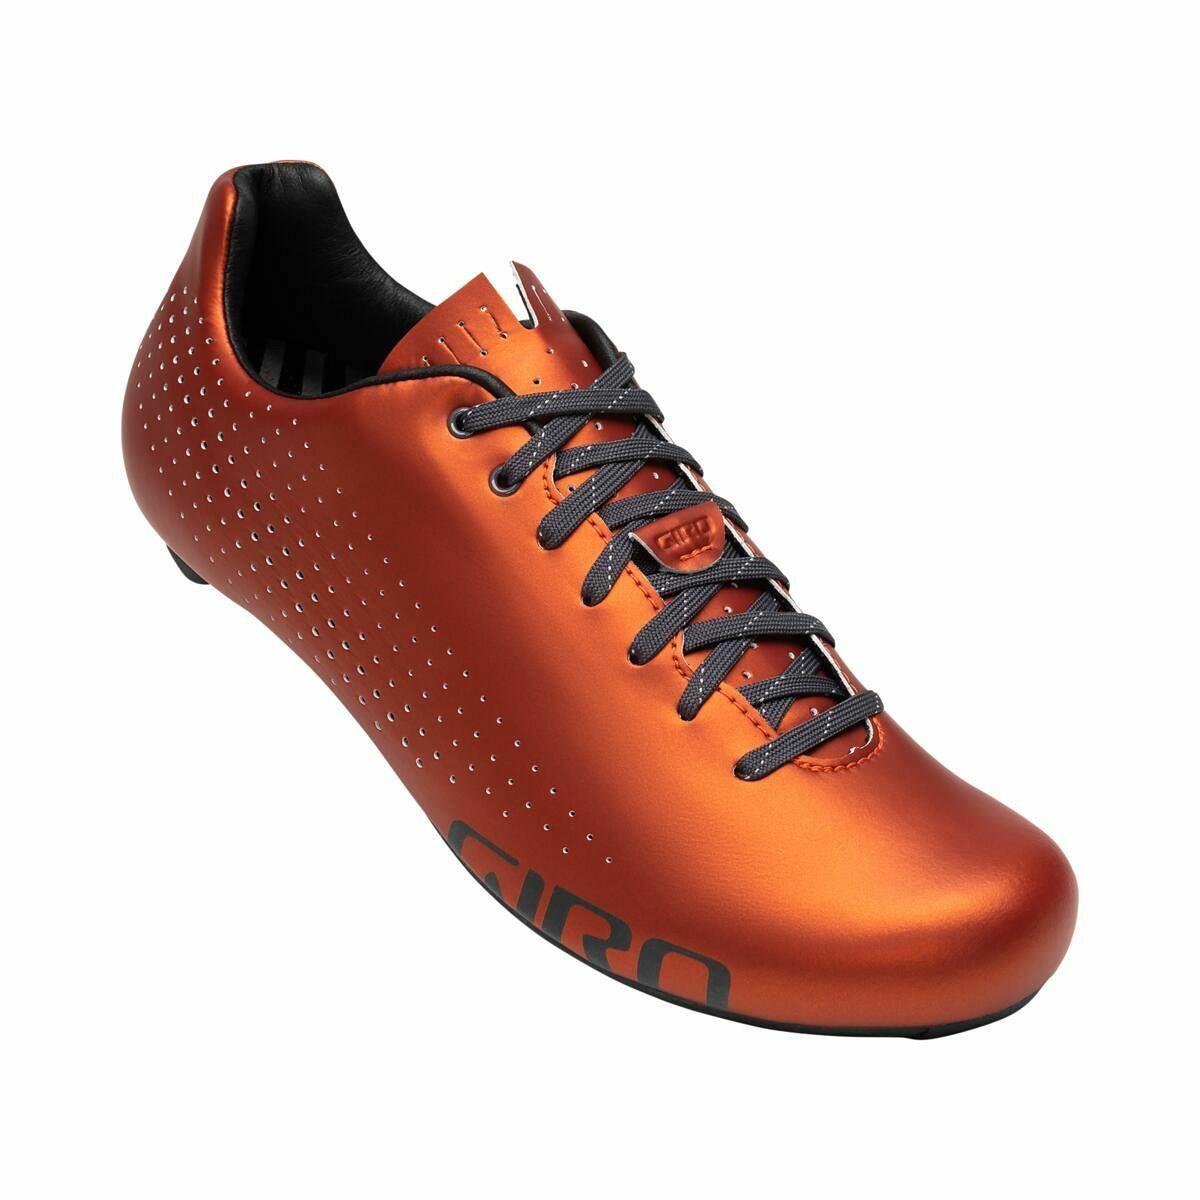 Giro Empire Rennrad Fahrrad Schuhe Orange 2020